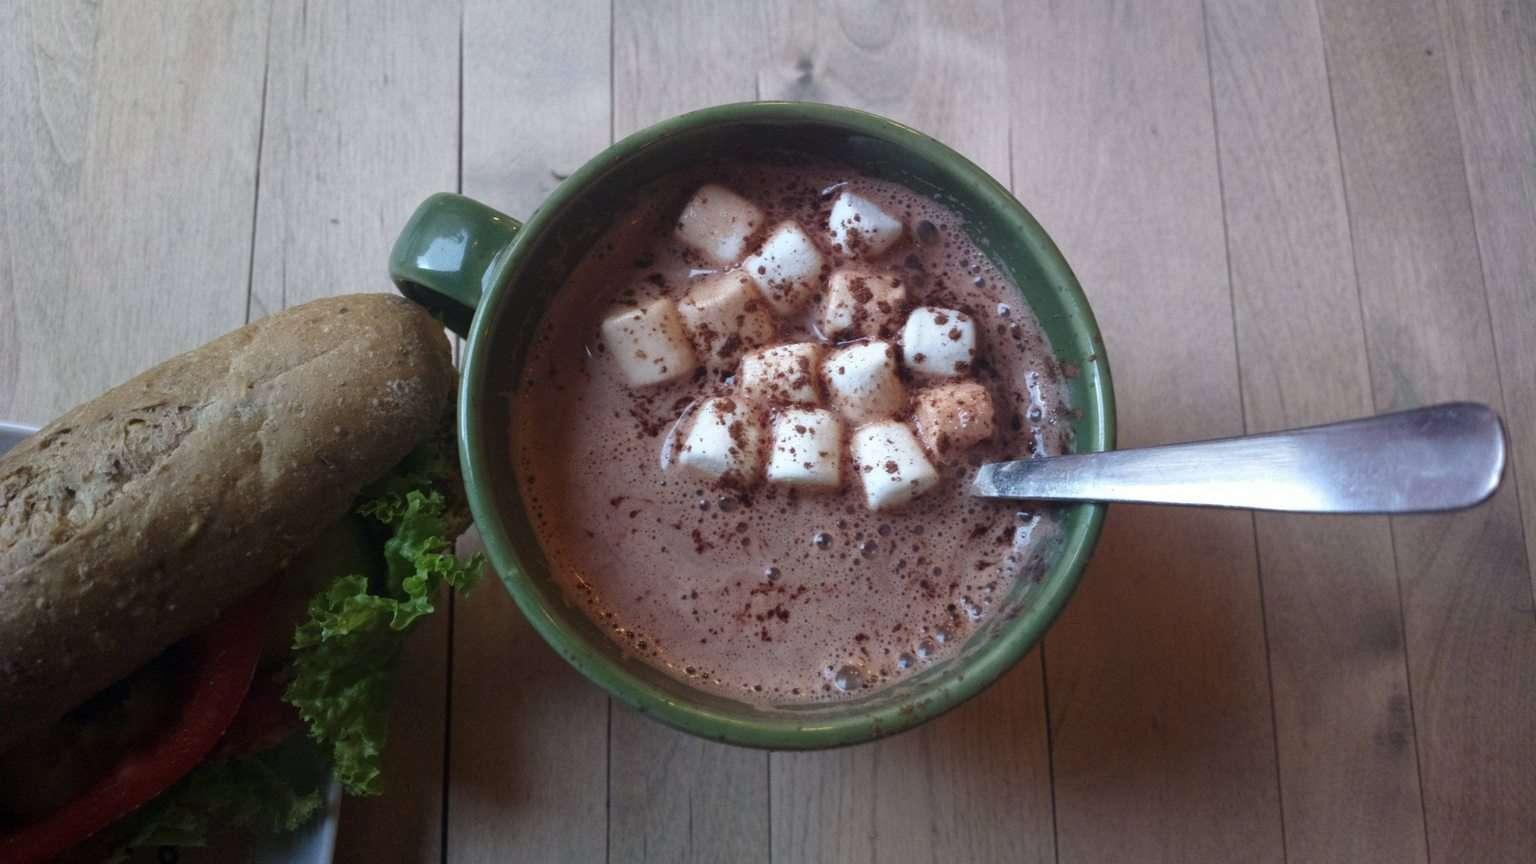 kakaovesandvic